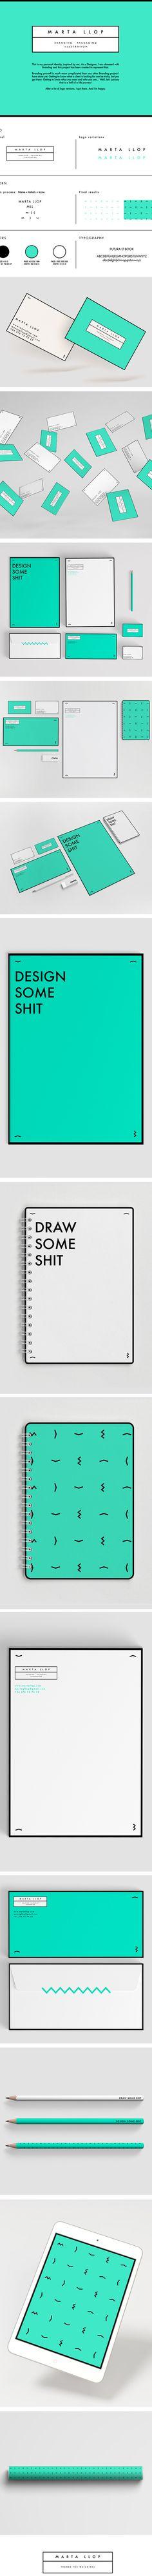 Designer: Marta Llop